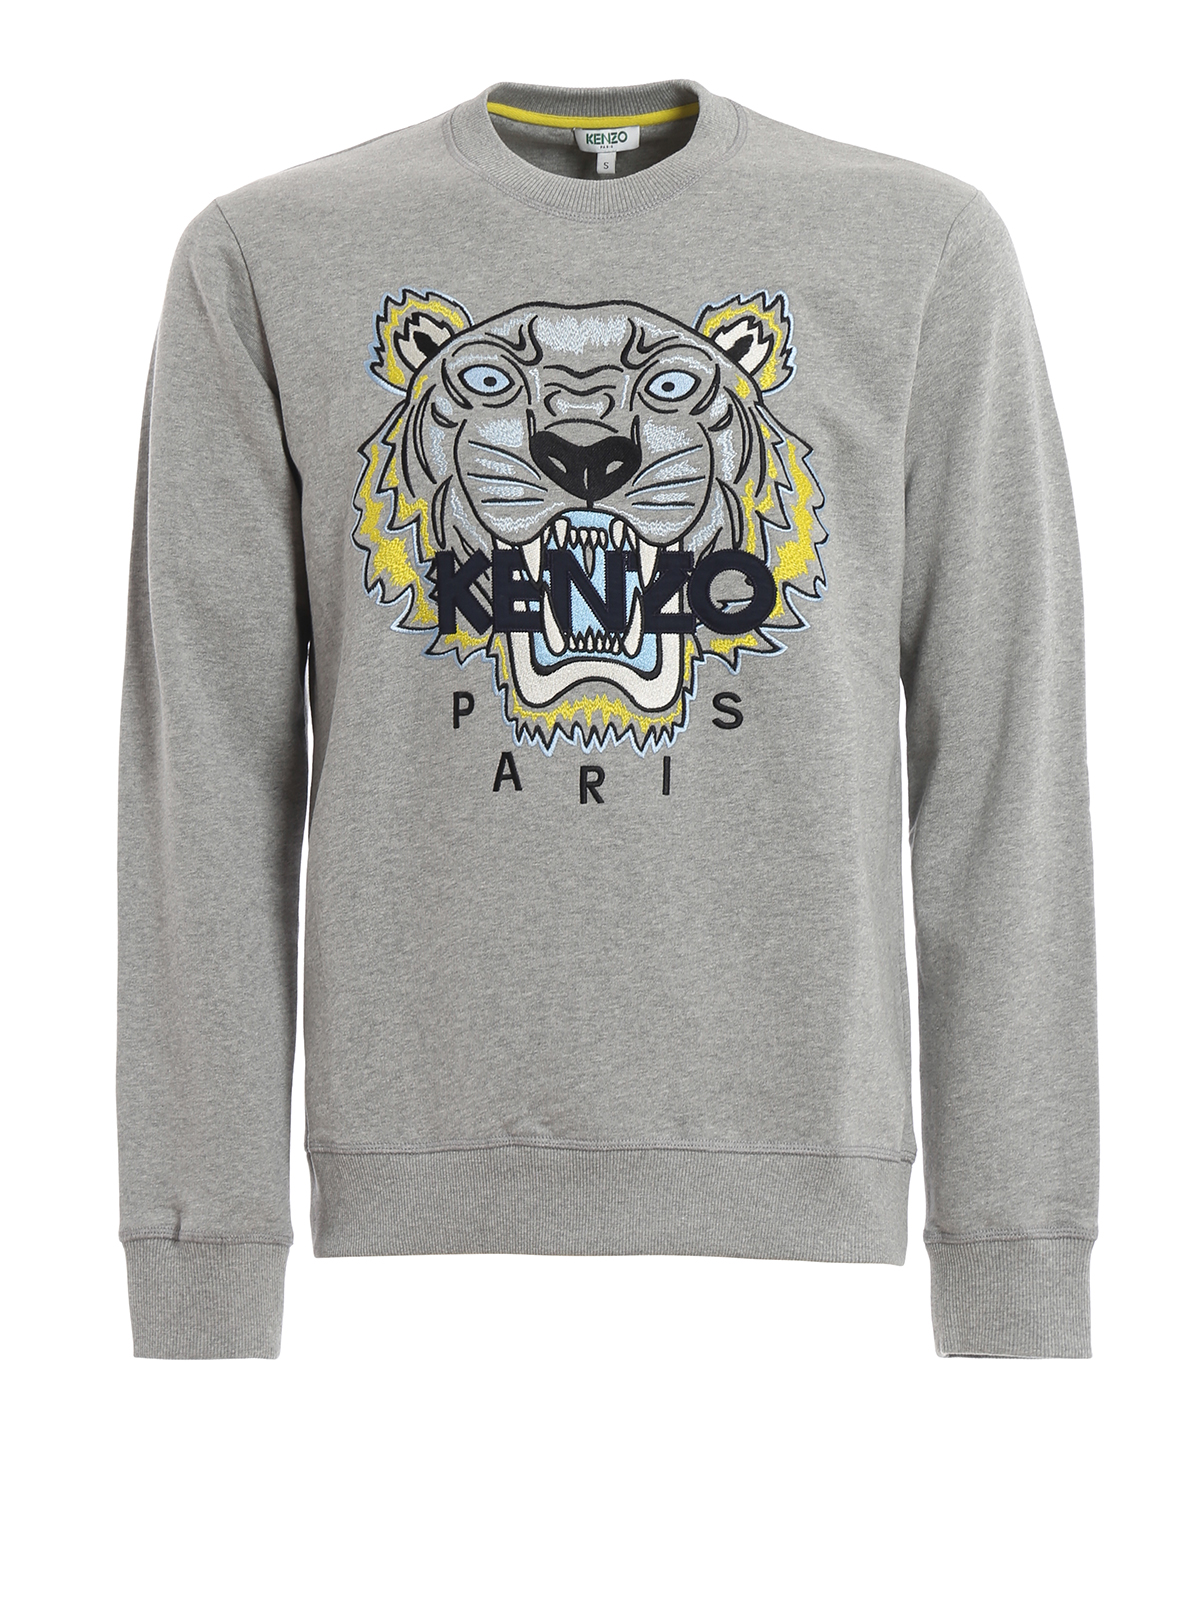 KENZO  Sweatshirts   Sweaters - Pearl grey cotton Tiger classic sweatshirt 05ea1d50929